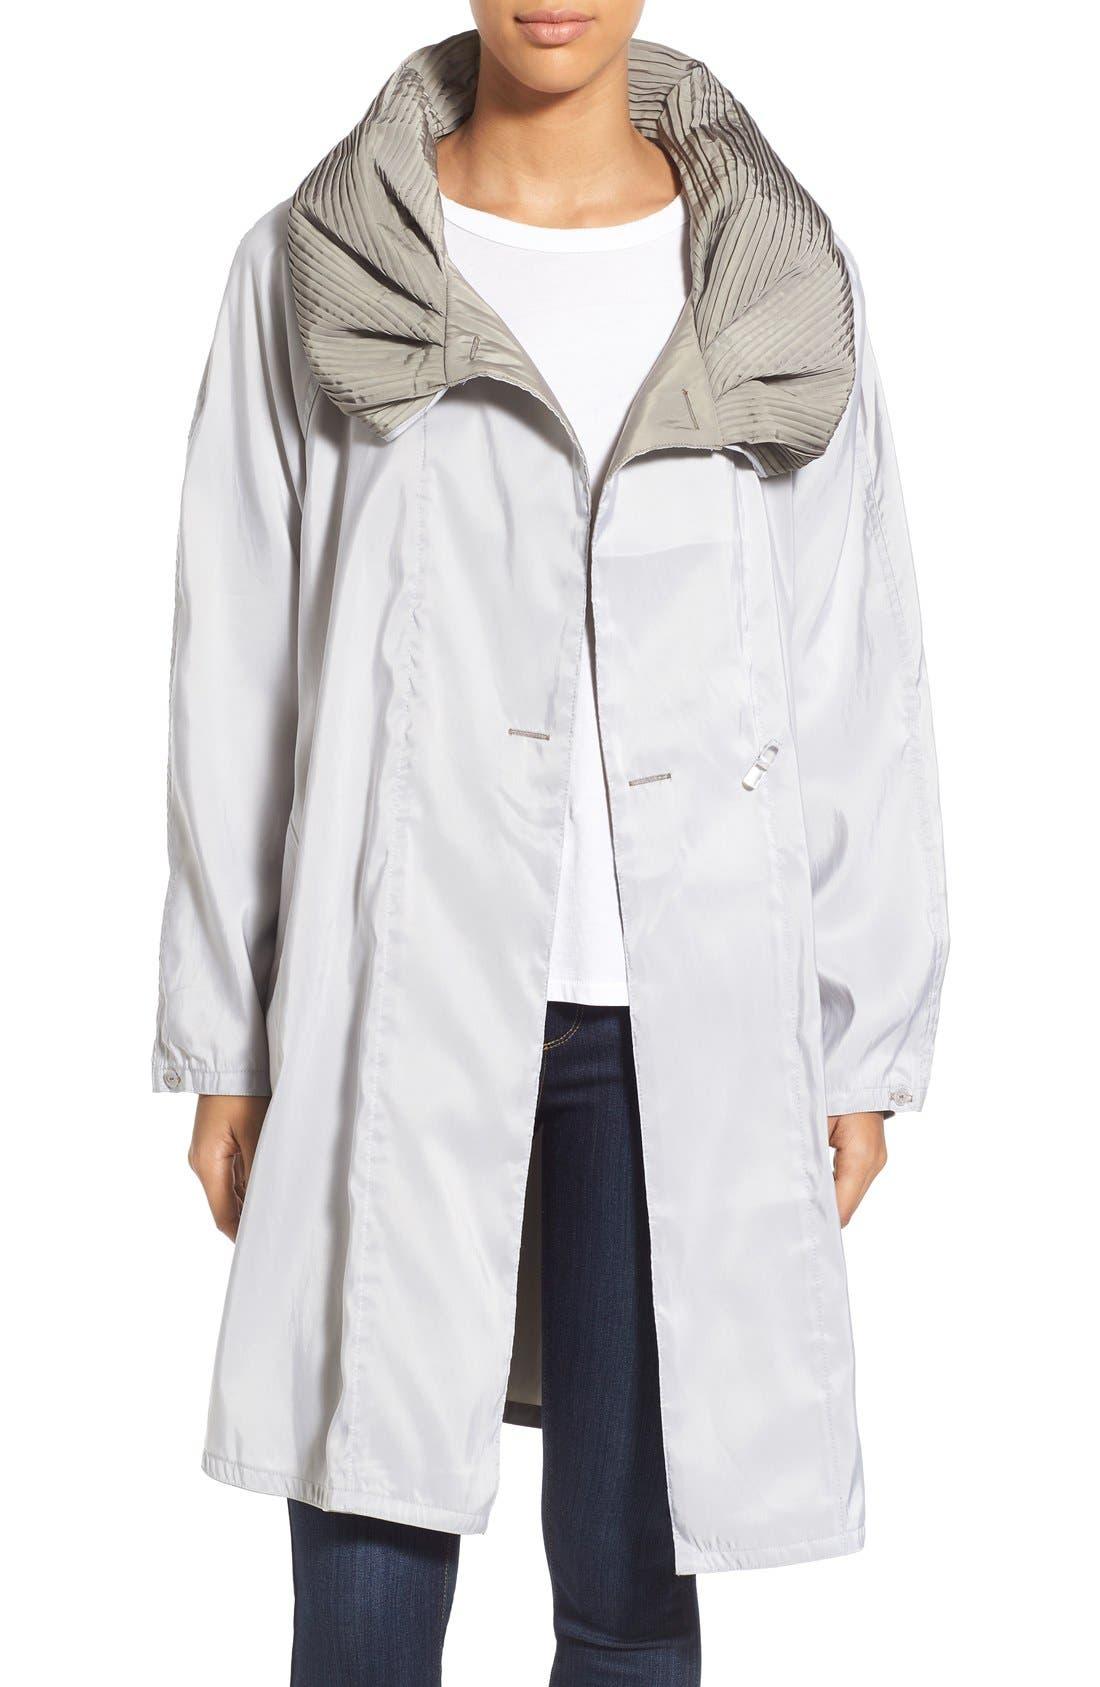 Main Image - Mycra Pac Designer Wear Reversible Pleat Hood Packable Travel Coat